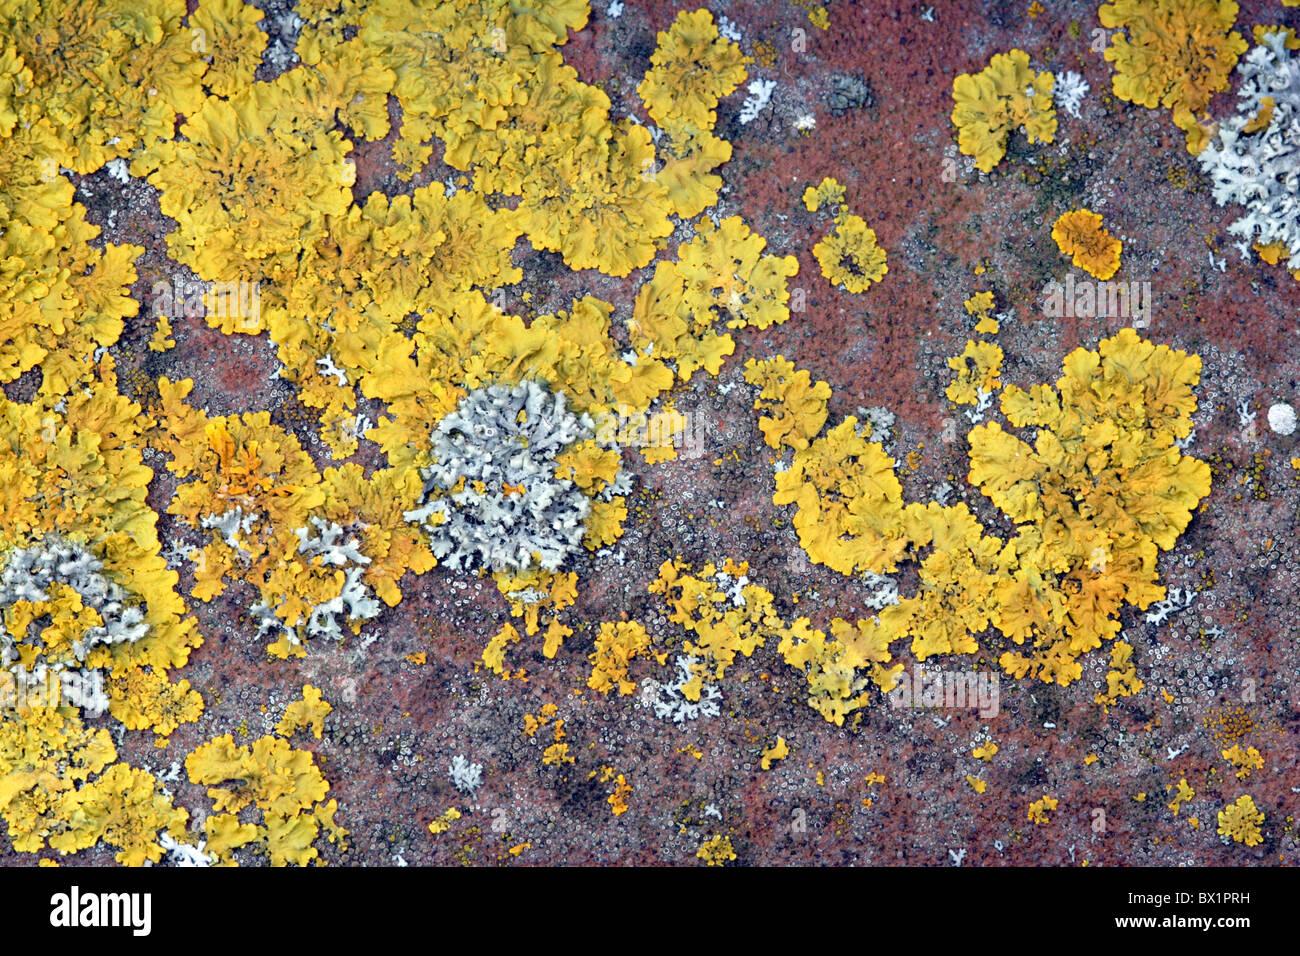 Lichen (Xanthoria parietina) growing on tile - Stock Image